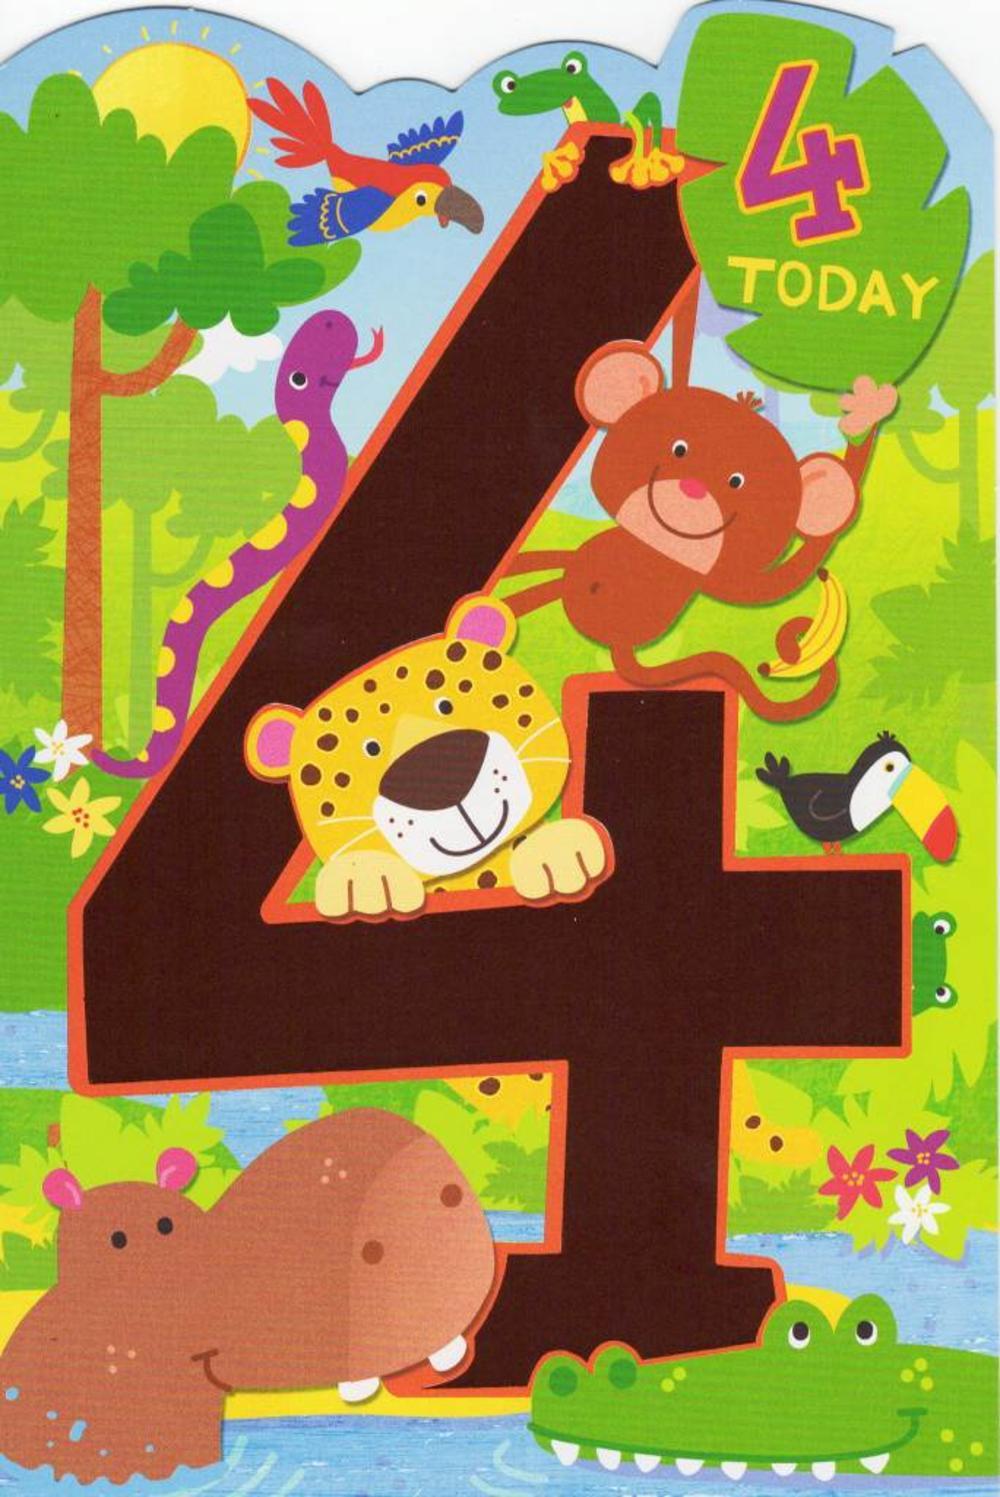 Childrens happy 4th birthday greeting card cards love kates childrens happy 4th birthday greeting card m4hsunfo